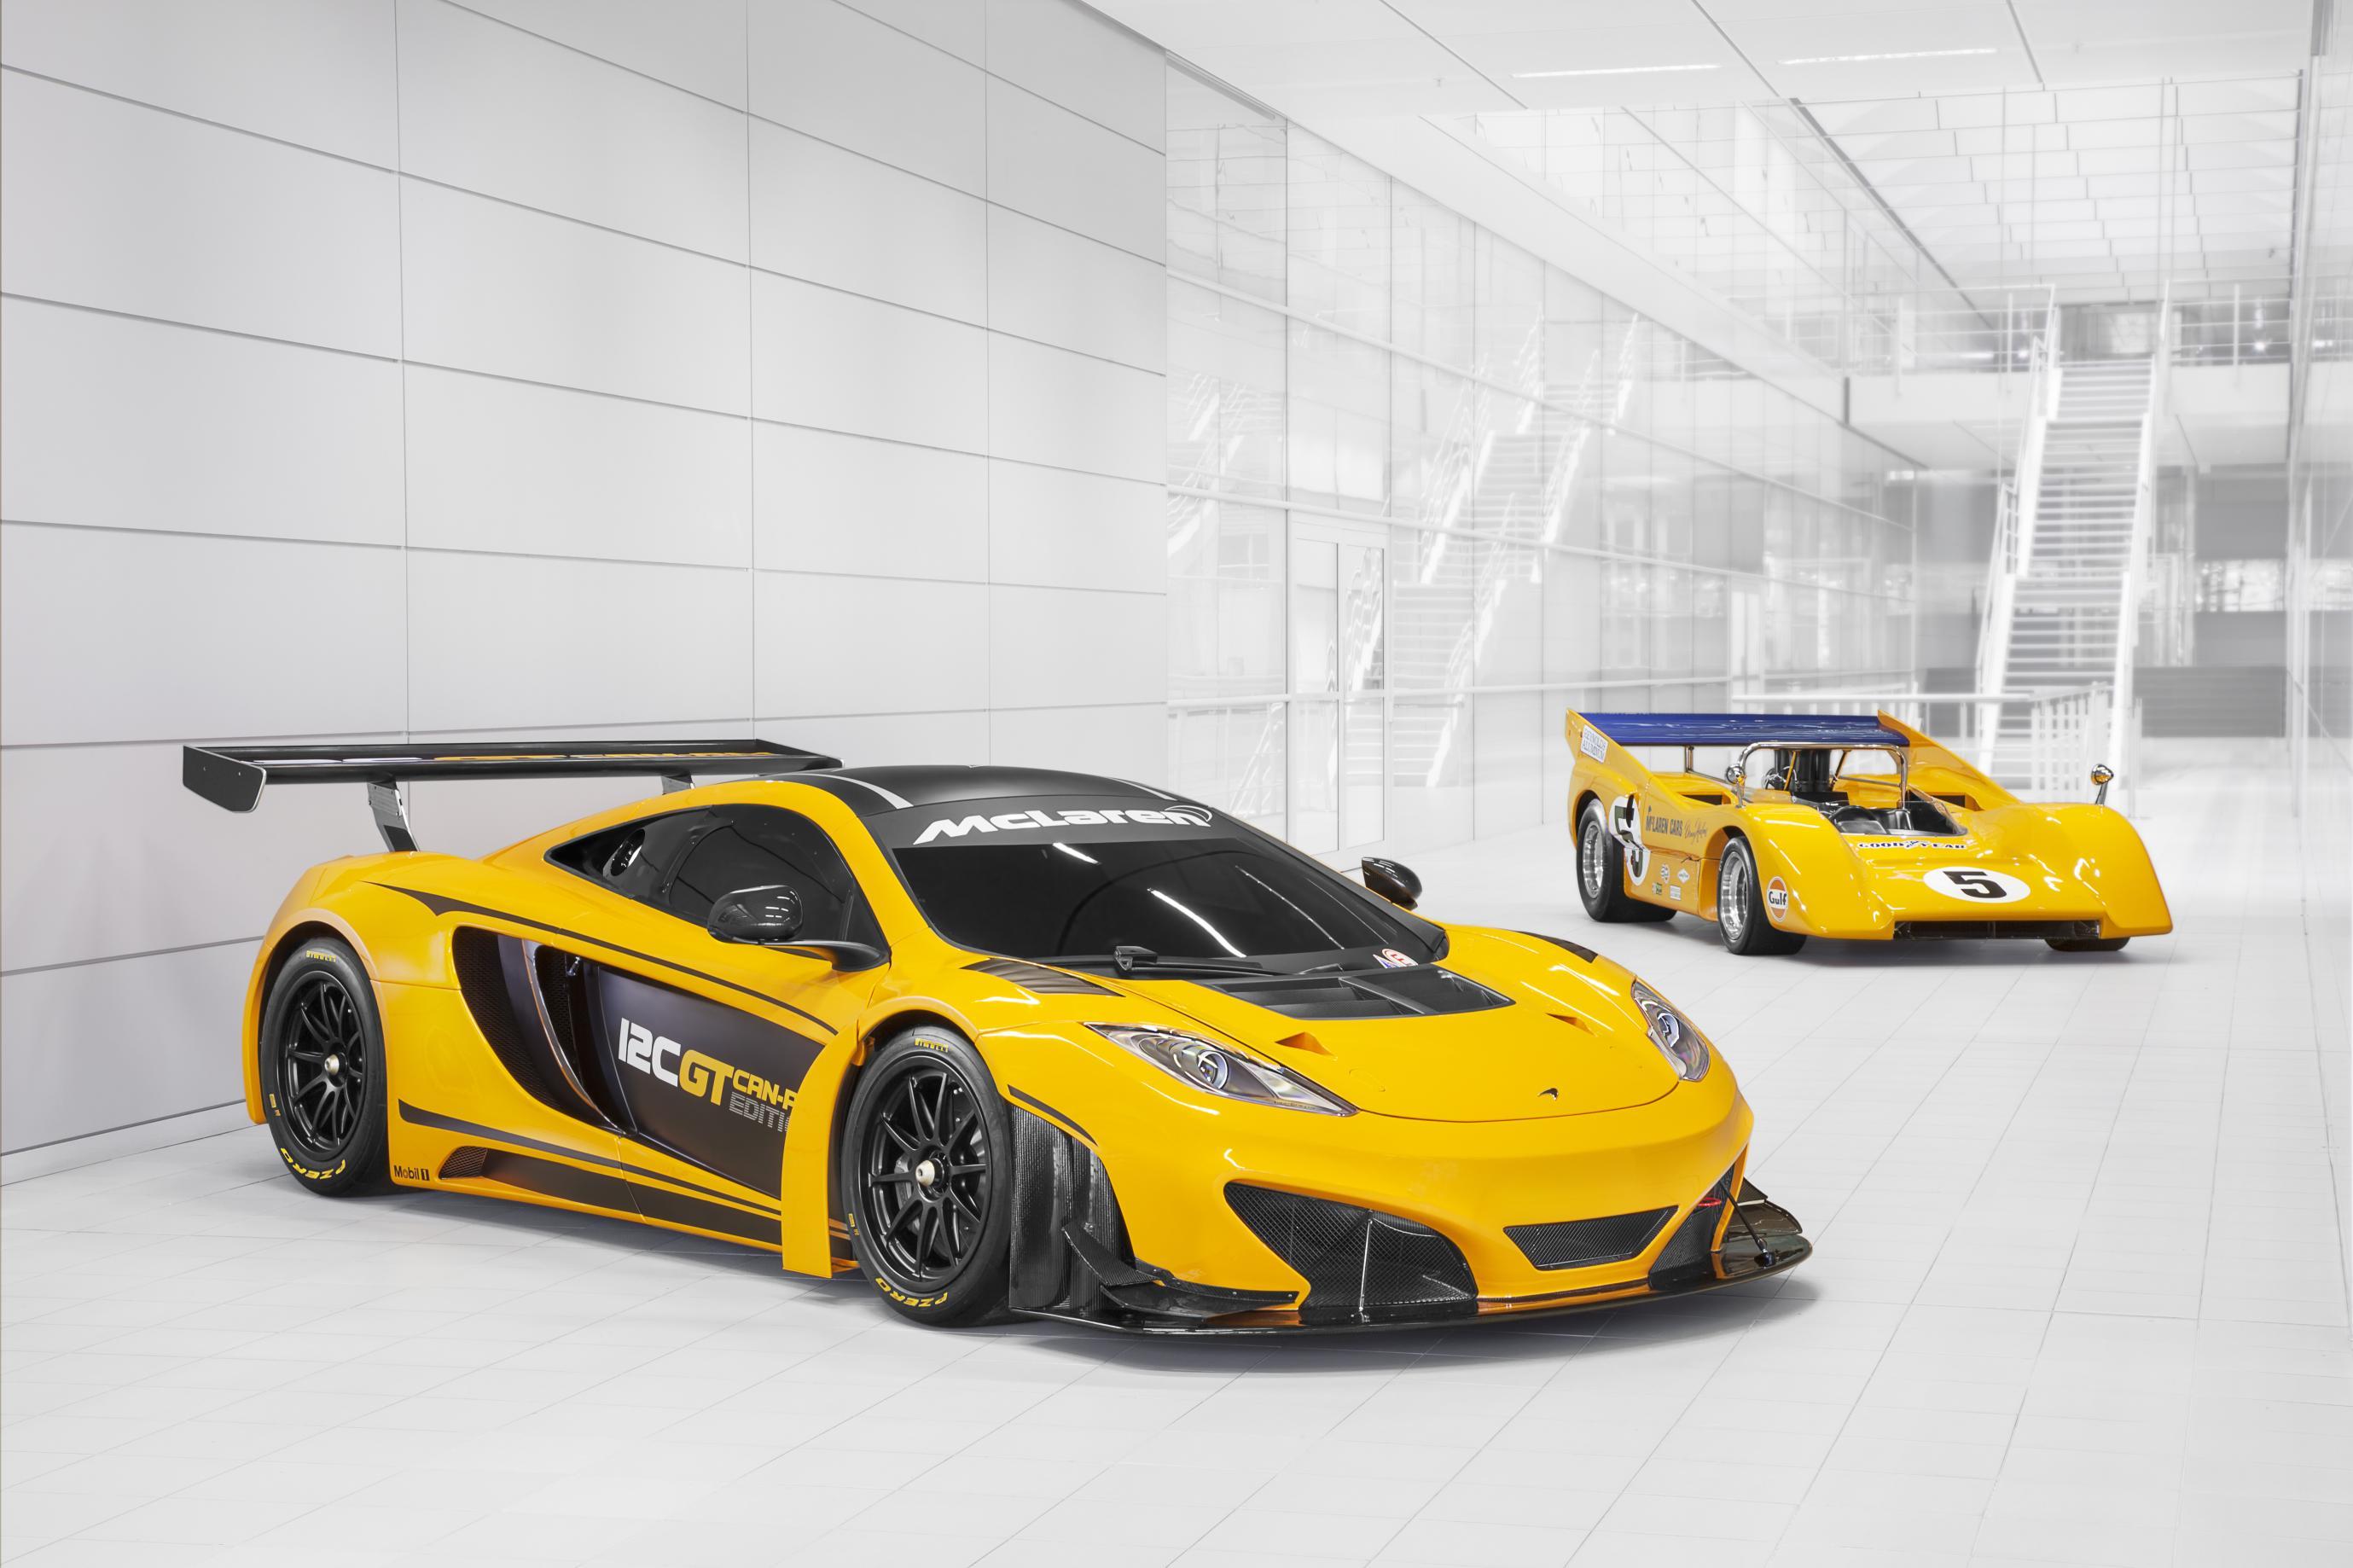 McLaren Soul • Championship-winning cars in McLaren's history